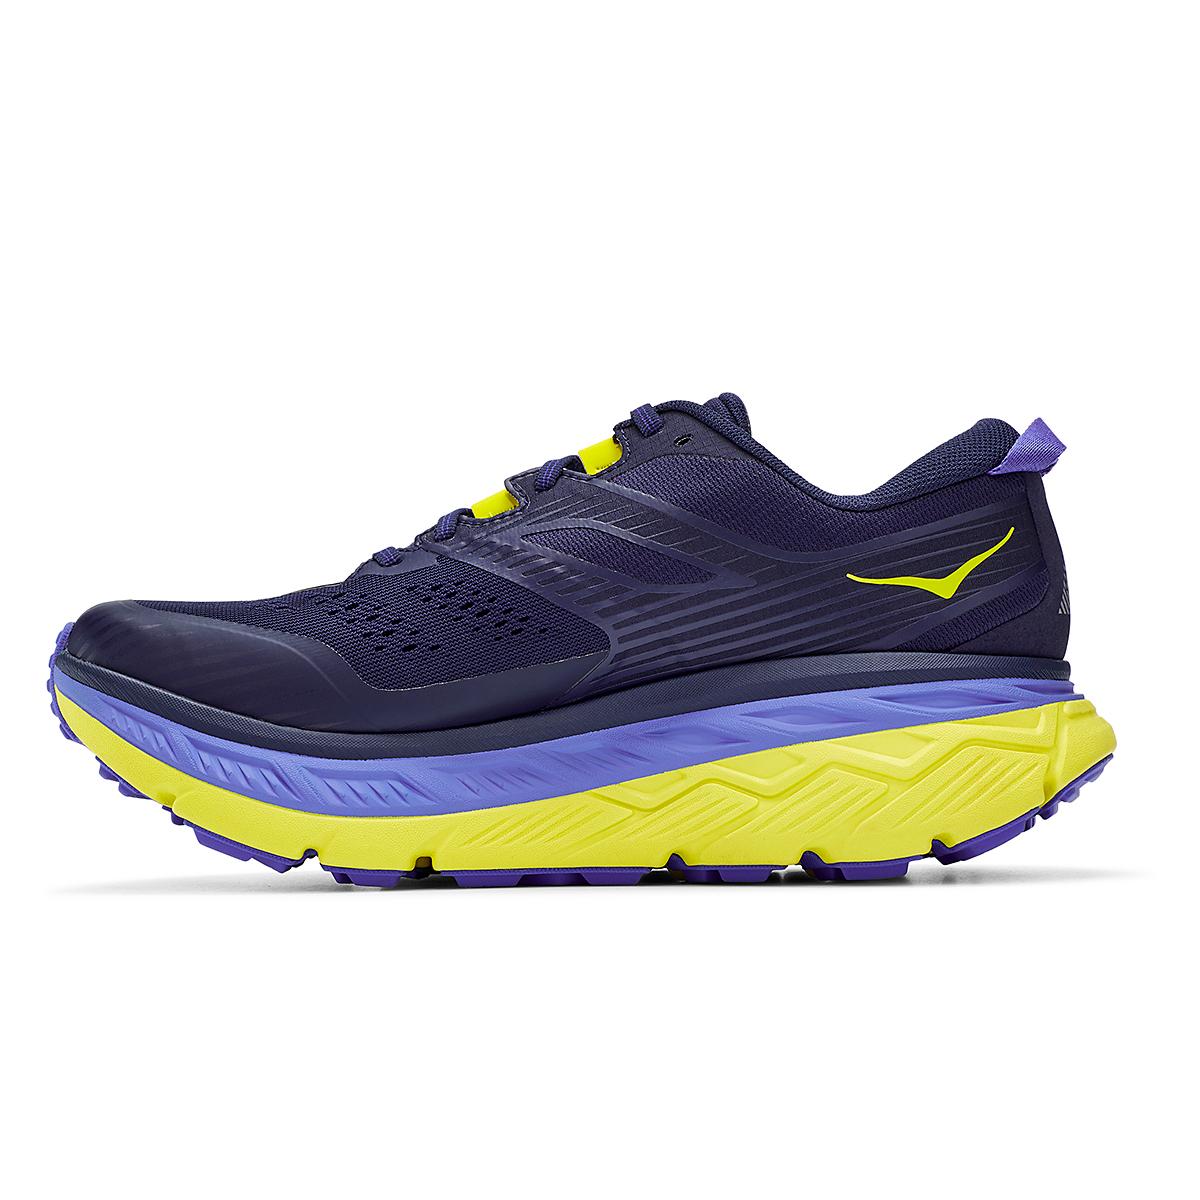 Men's Hoka One One Stinson Atr 6 Trail Running Shoe - Color: Black Iris/Evening Primrose - Size: 7 - Width: Regular, Black Iris/Evening Primrose, large, image 6